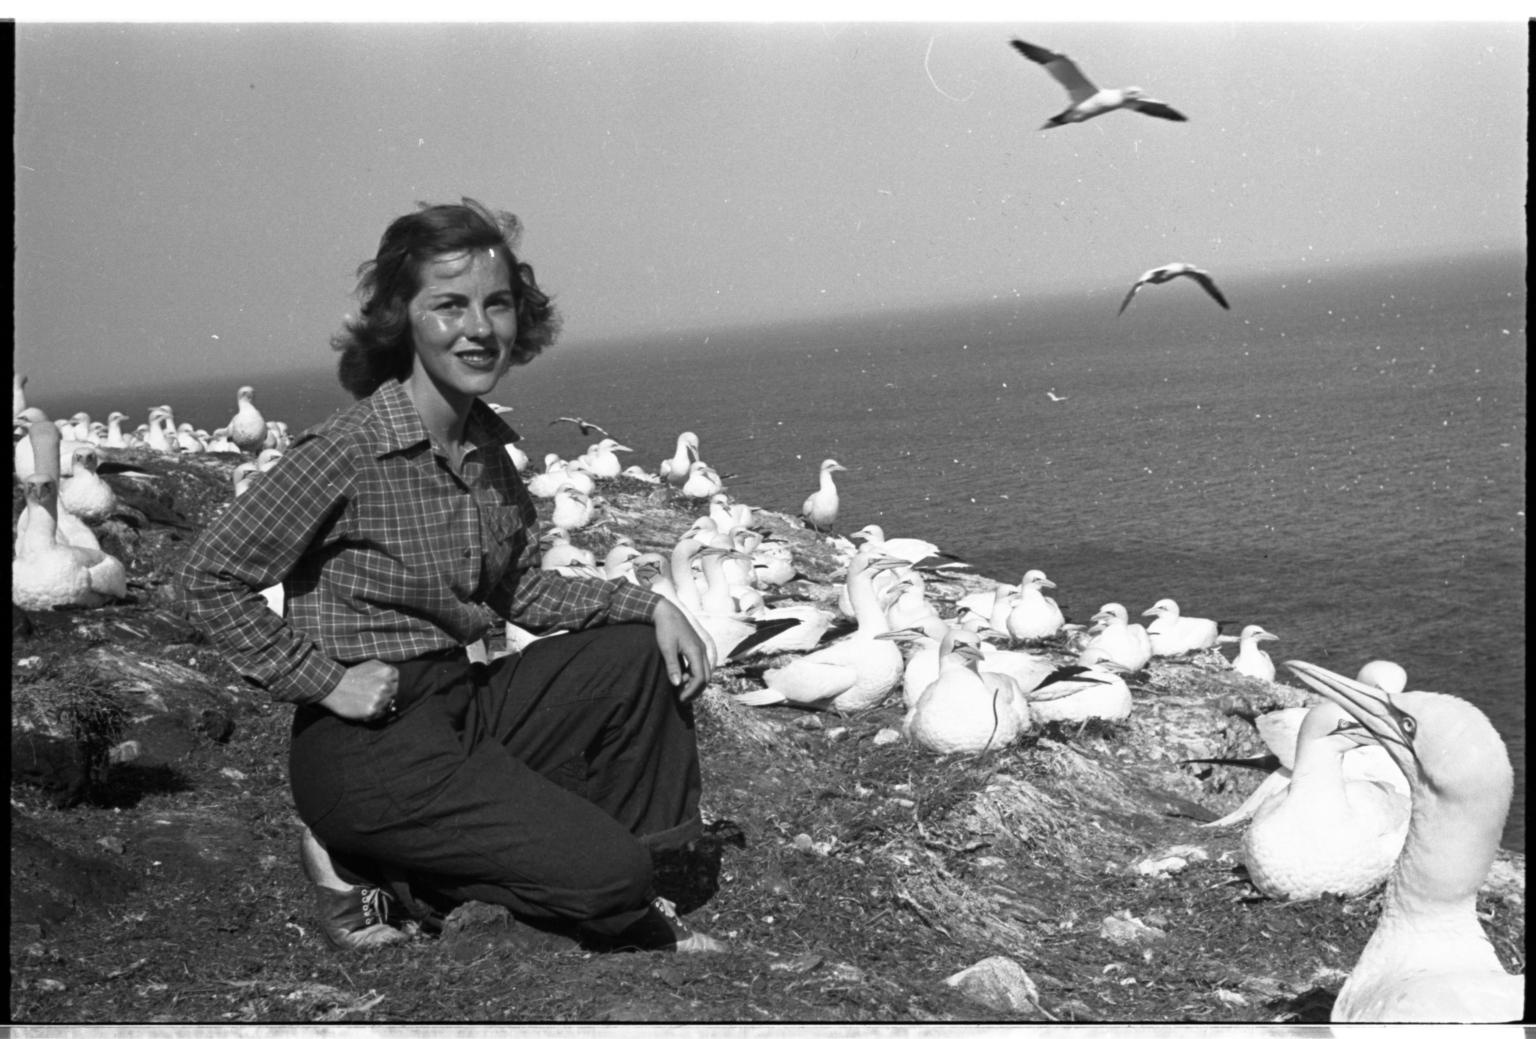 Field trip to study gannets for new exhibit Bonaventure Island